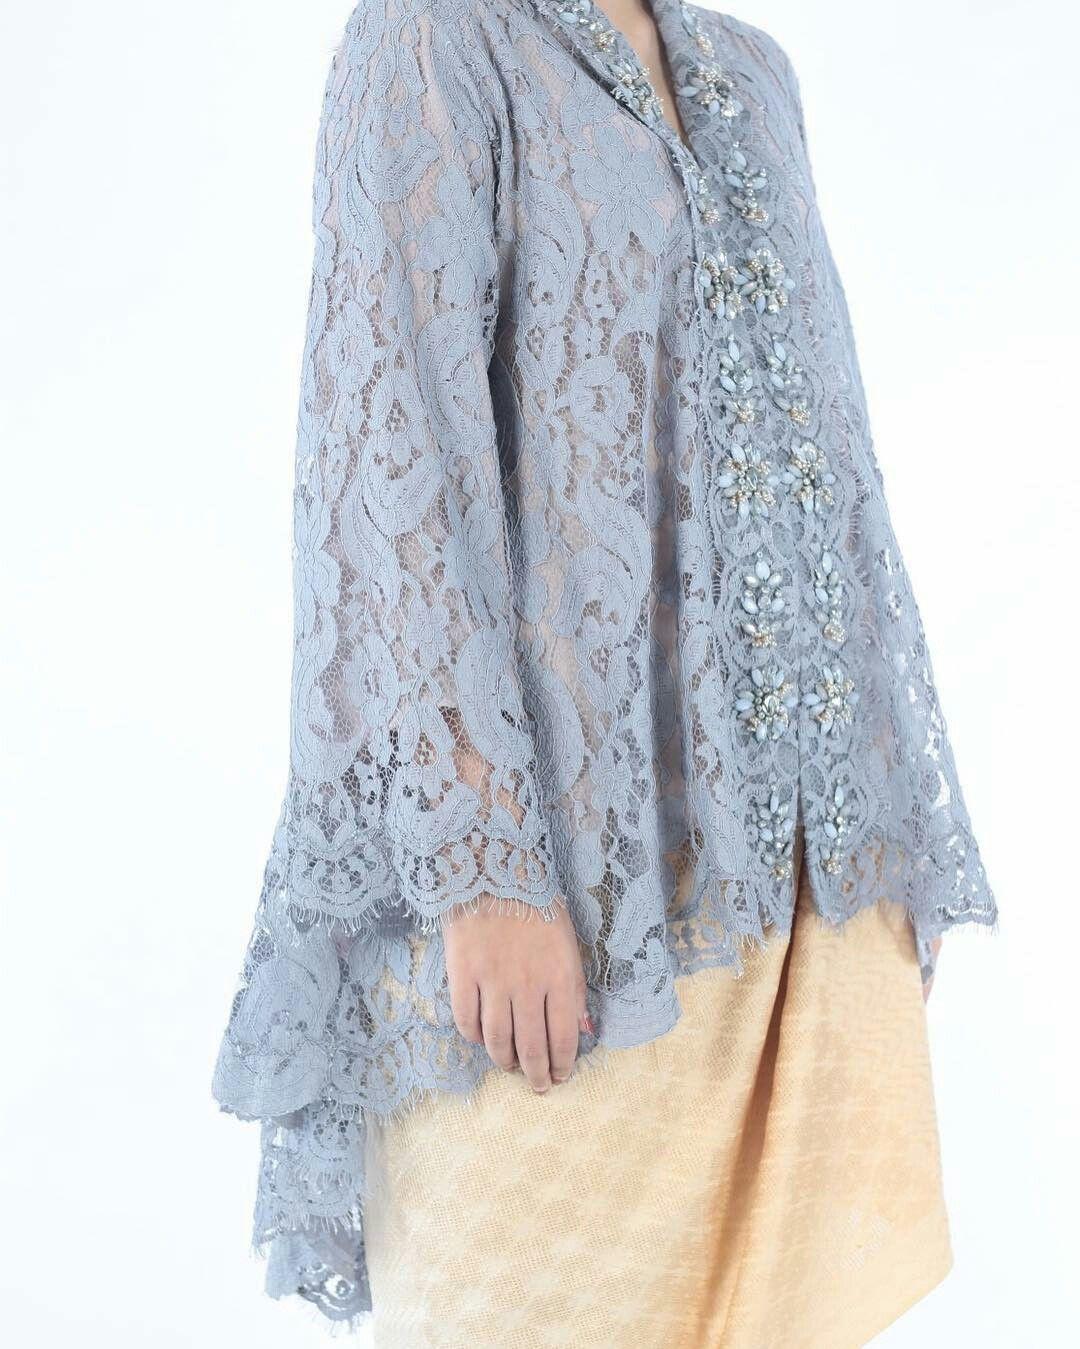 Kebaya Baju Kebaya Batik a73ec24b11